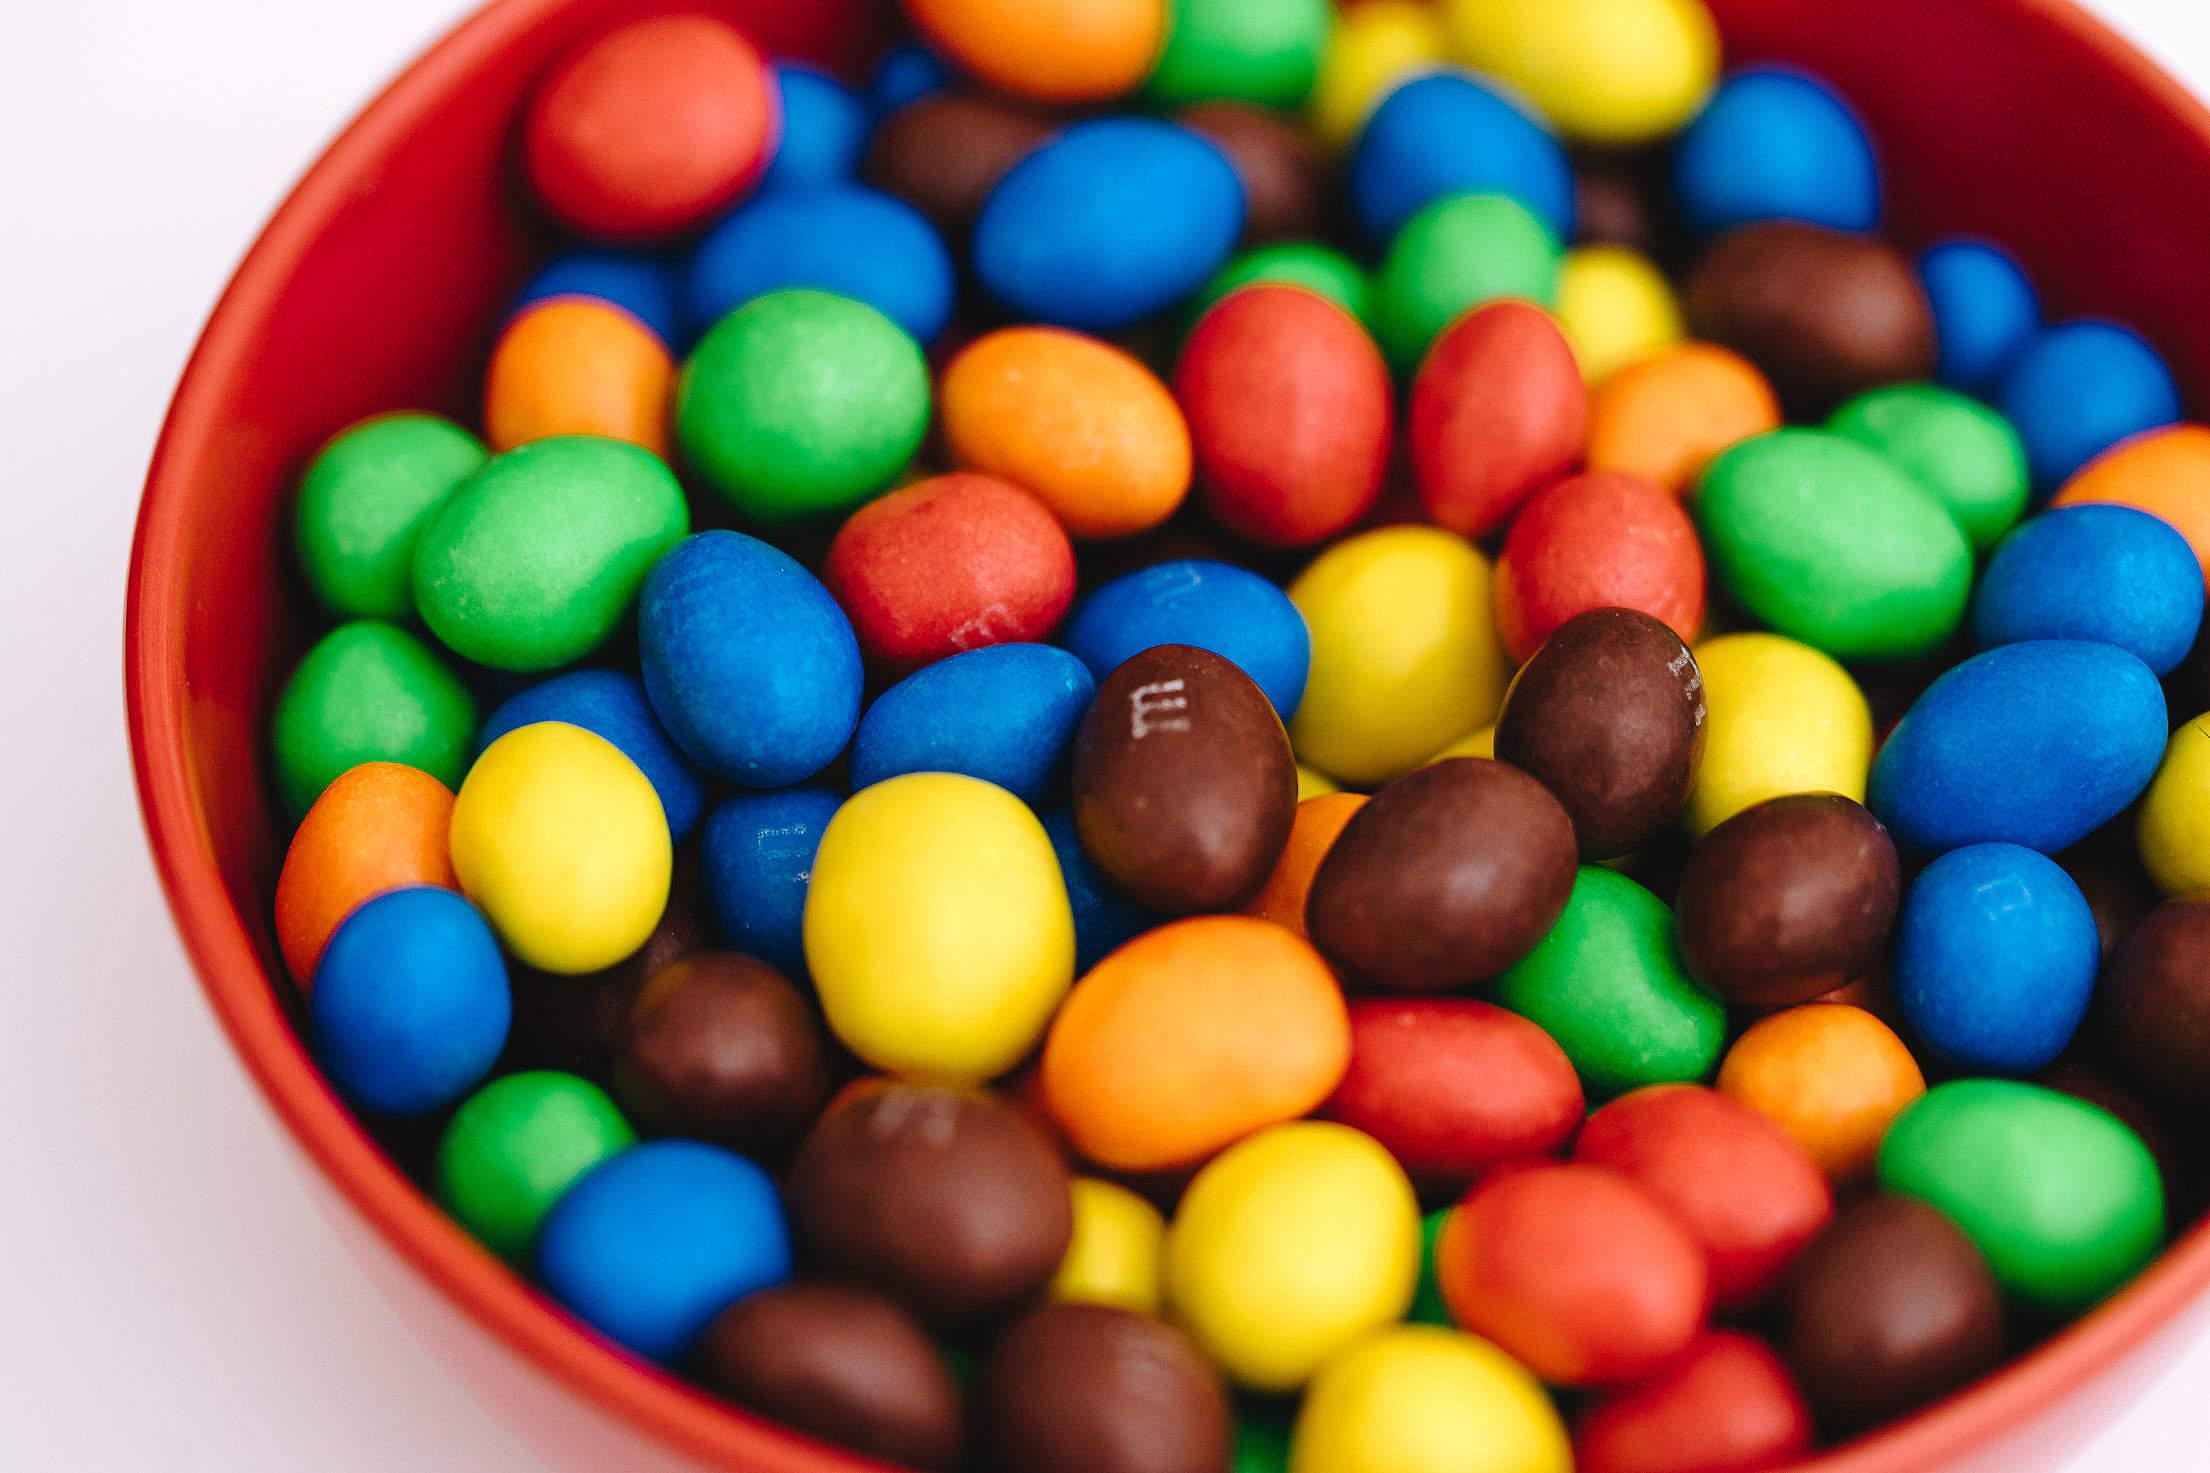 Tasty M&M's Peanut Chocolates Free Stock Photo